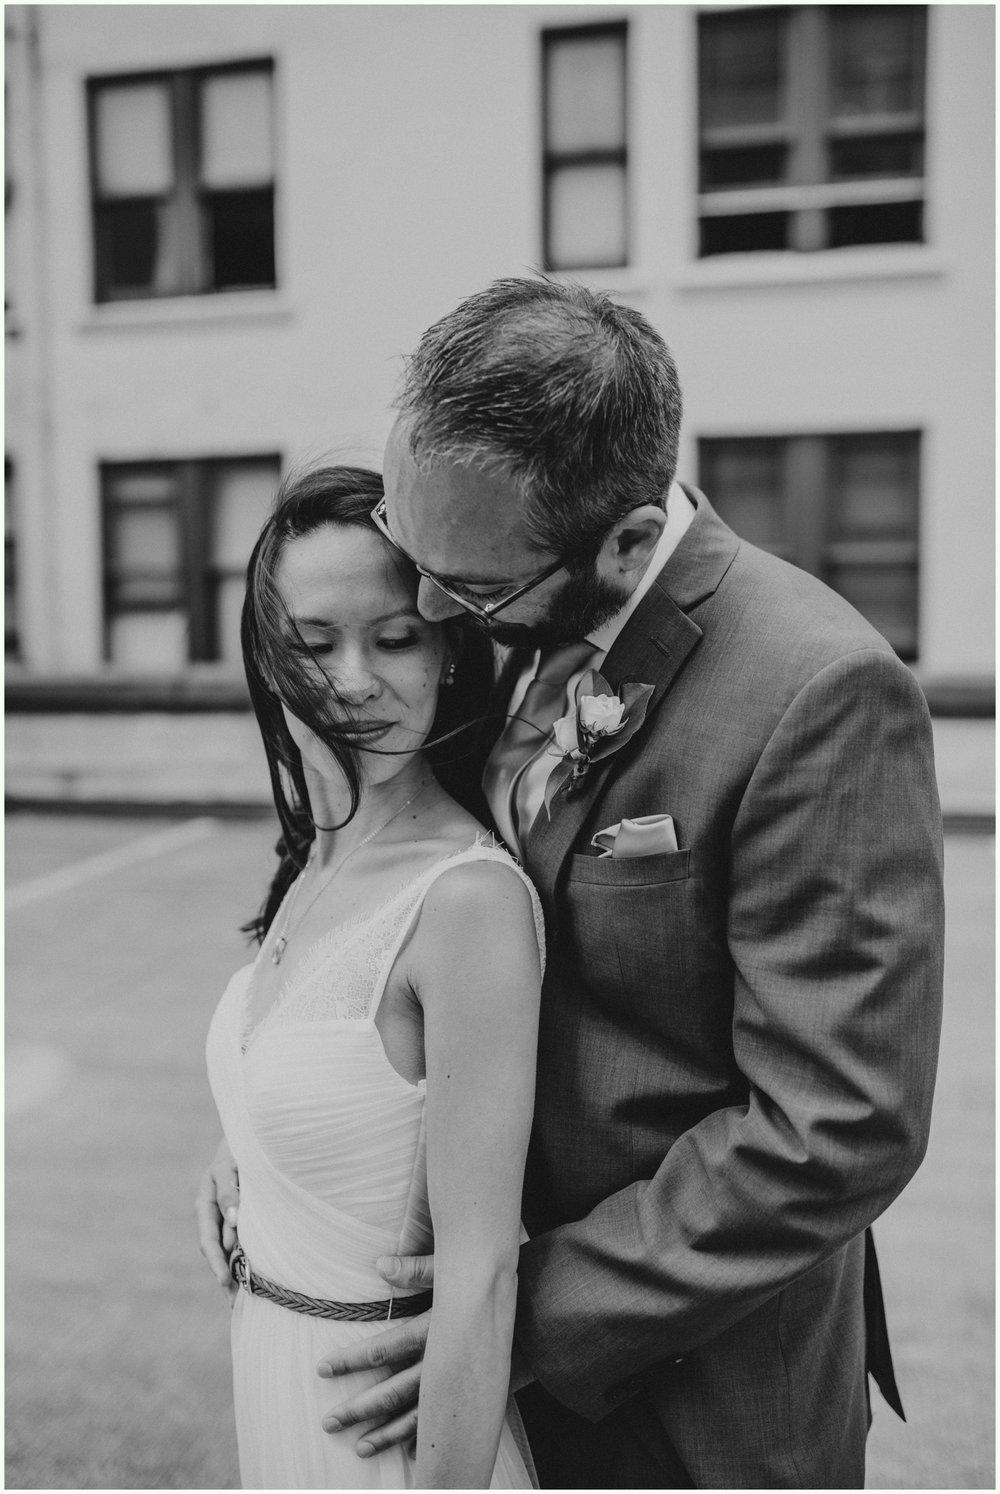 within-sodo-june-wedding-seattle-photographer-caitlyn-nikula-38.jpg